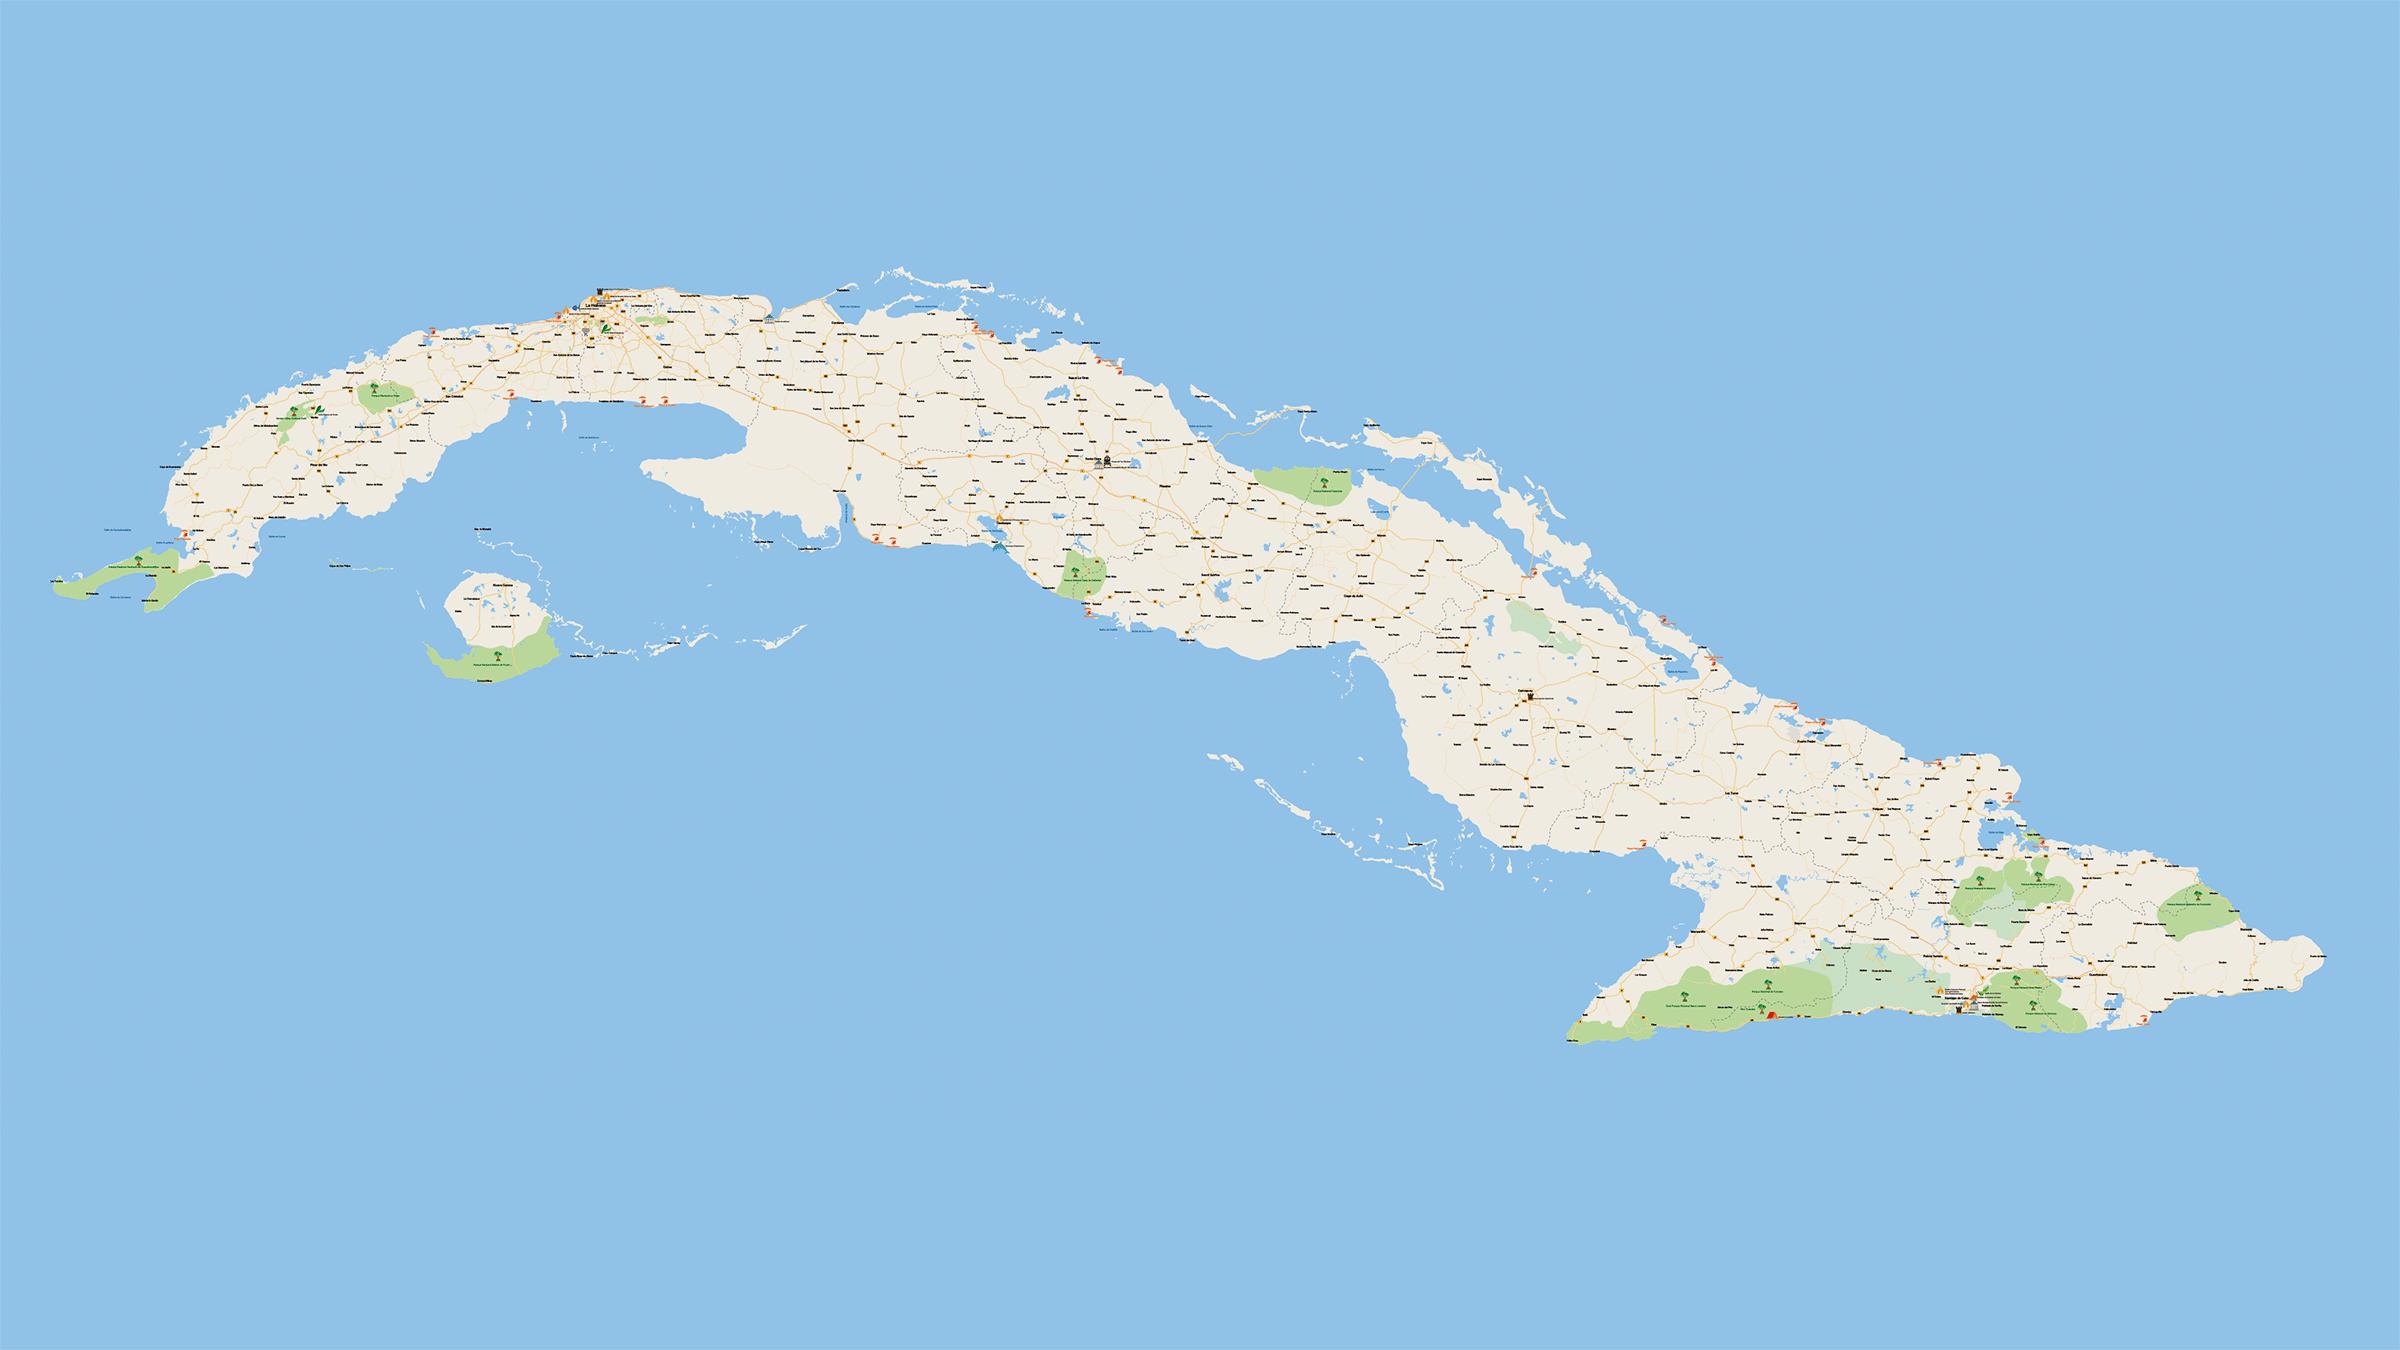 Cuba Mapa Del Mundo.Mapa De Municipios De Cuba Mapa De Cuba Cuba Mapas Del Mundo